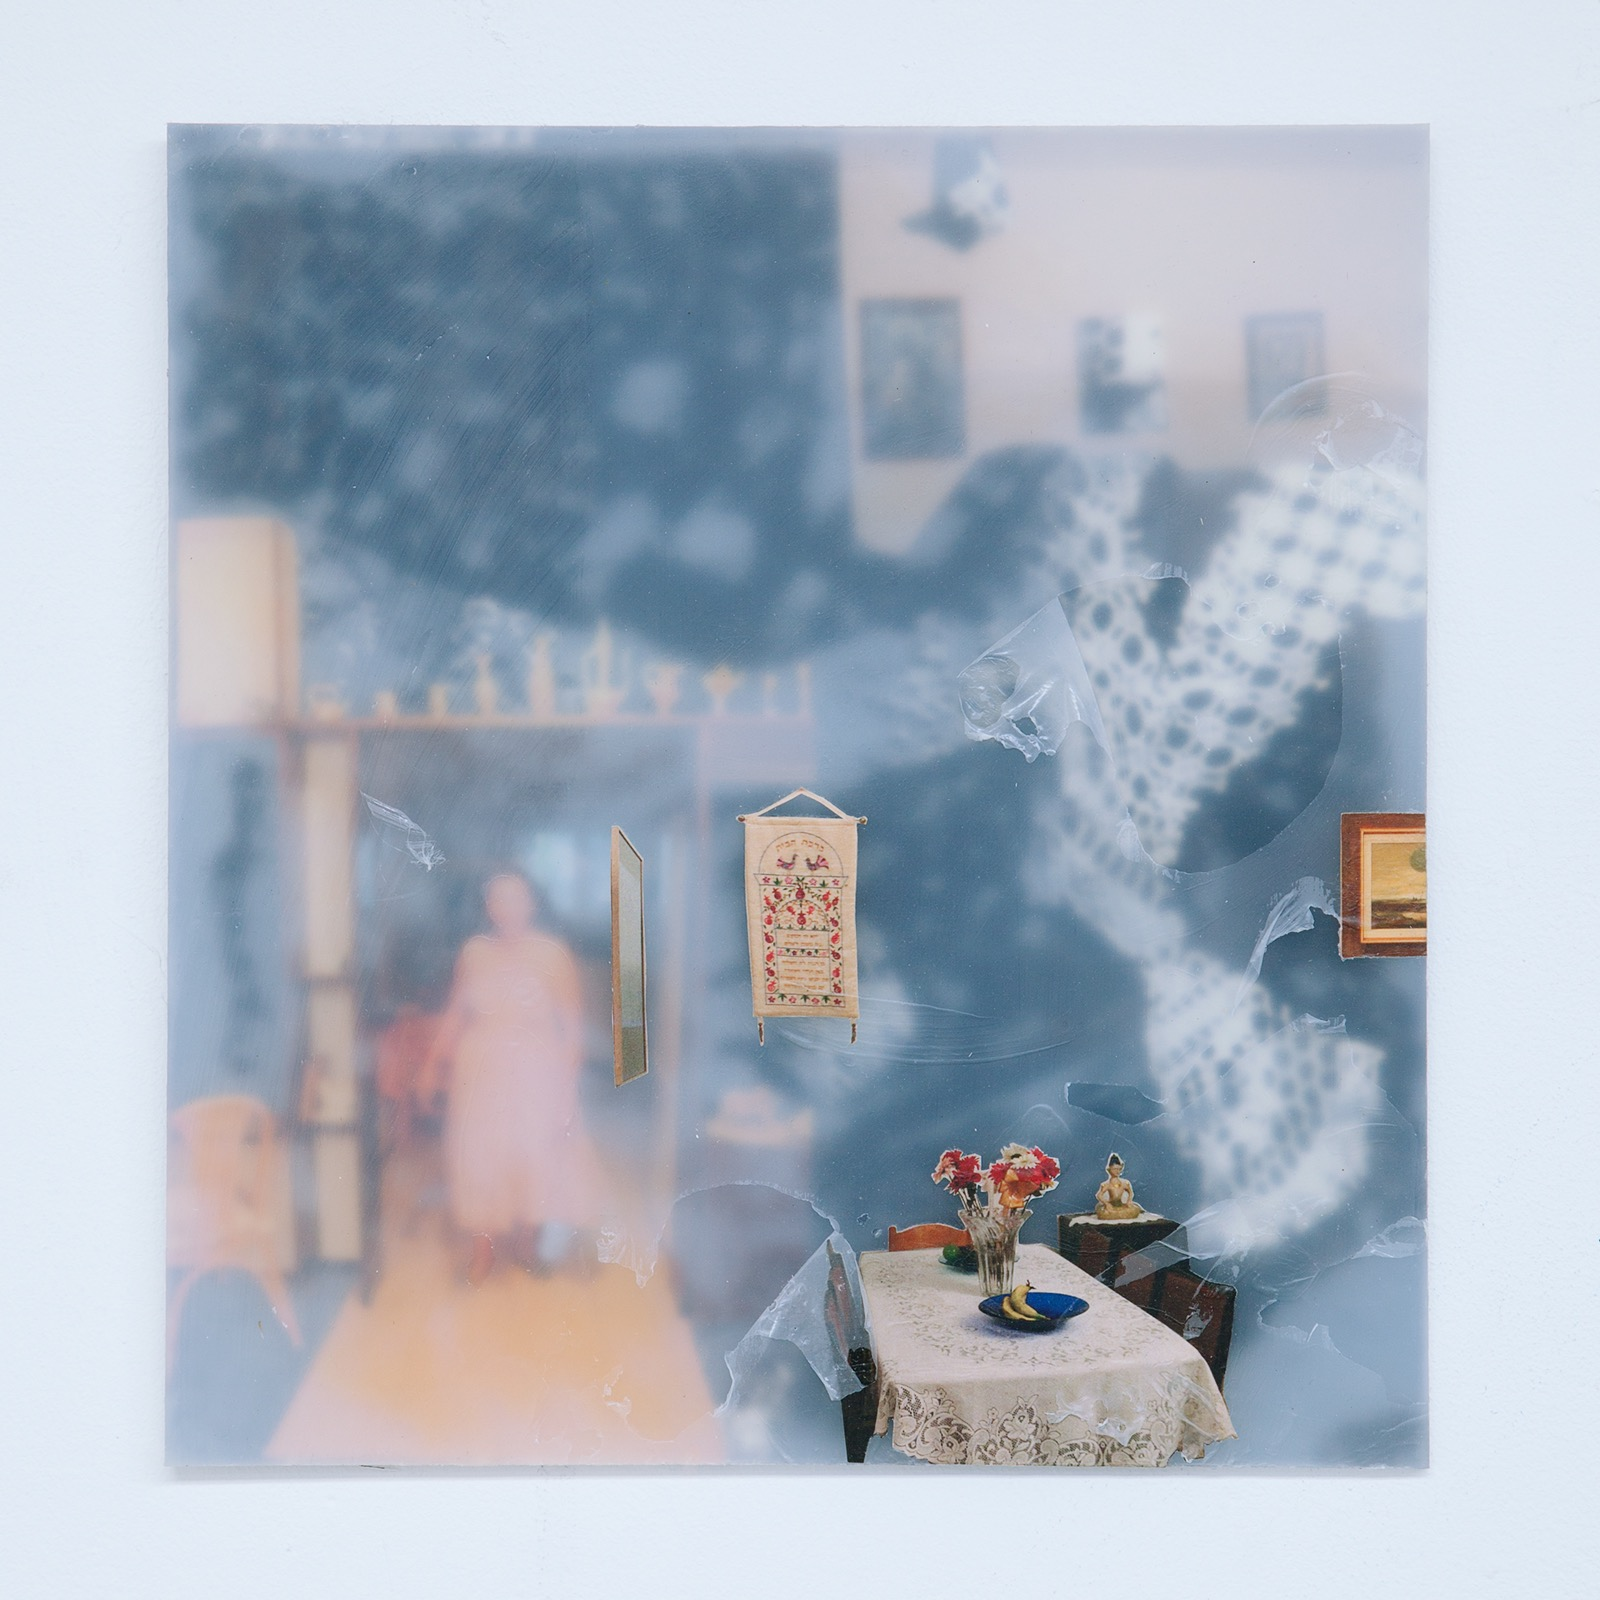 Manang'sMezuzah, 2014, monotype, collage, photographs, plastic, plexiglass, 14 x 13 inches